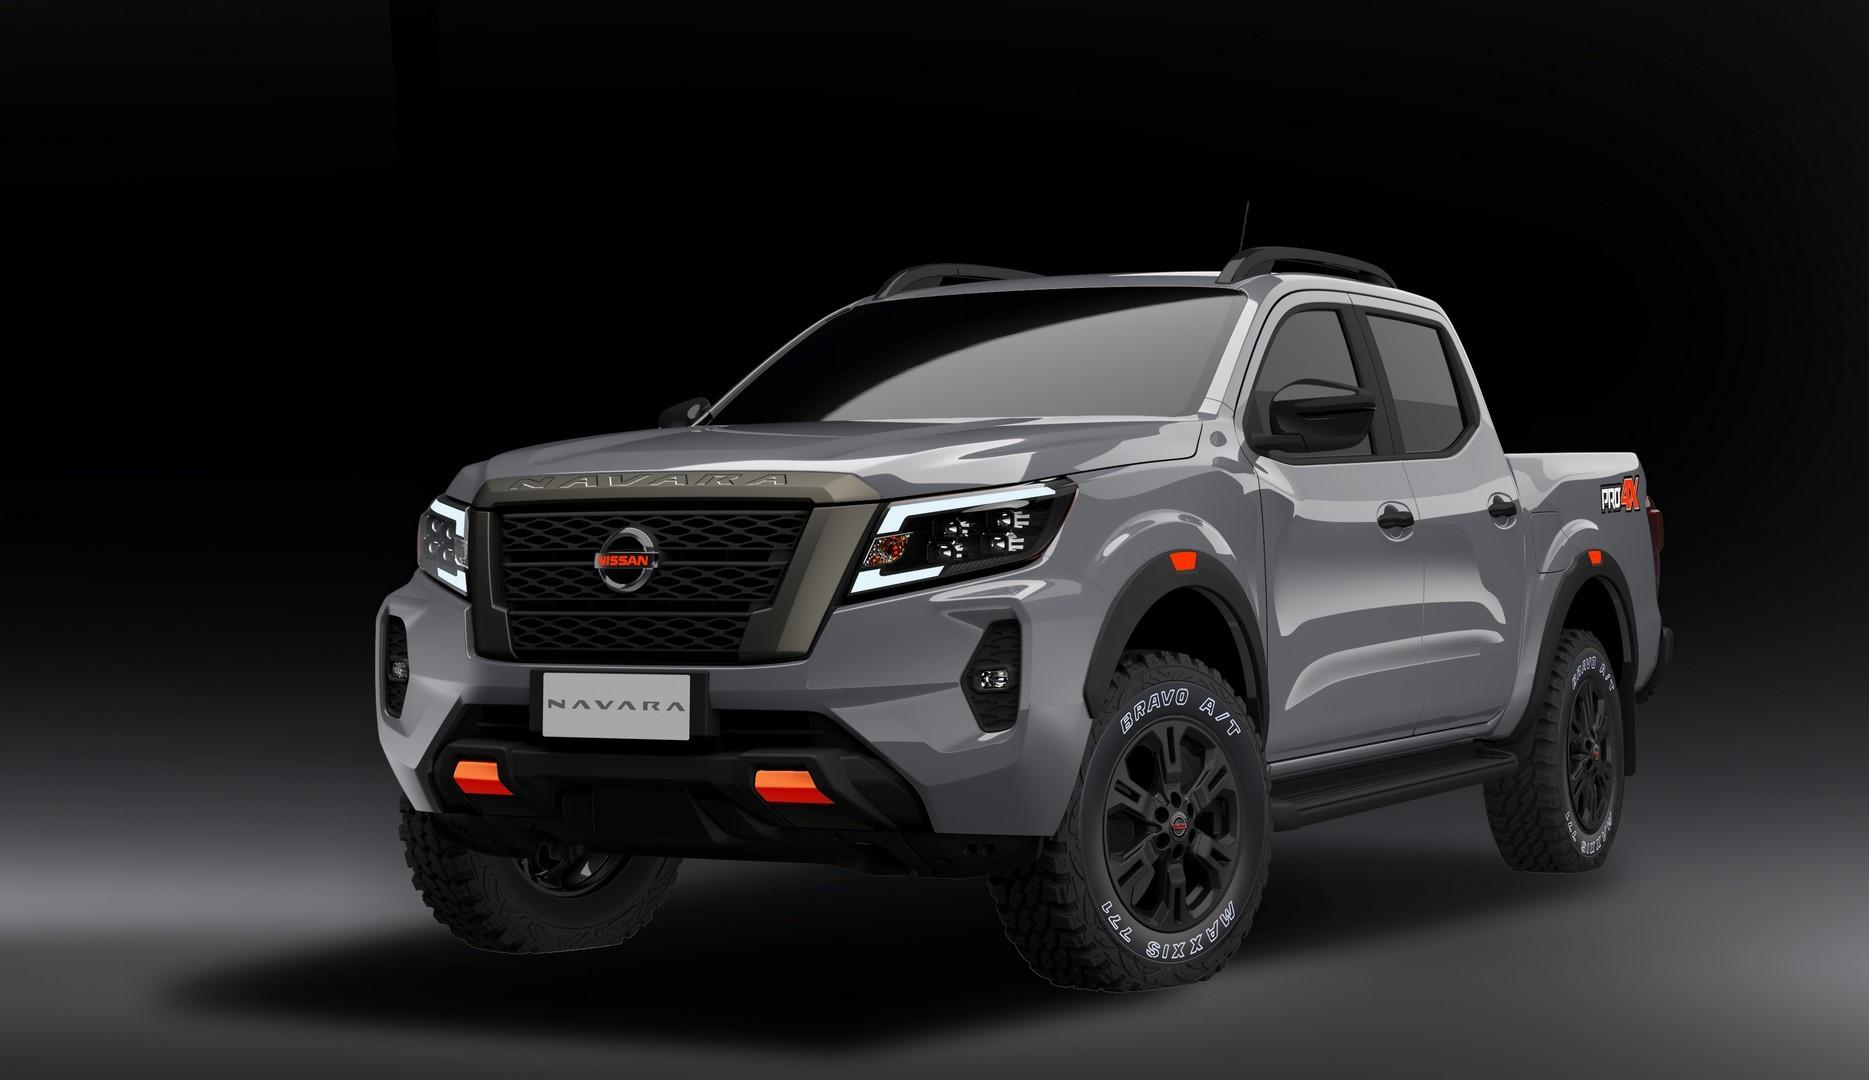 Nissan-Navara-2021-facelift-8